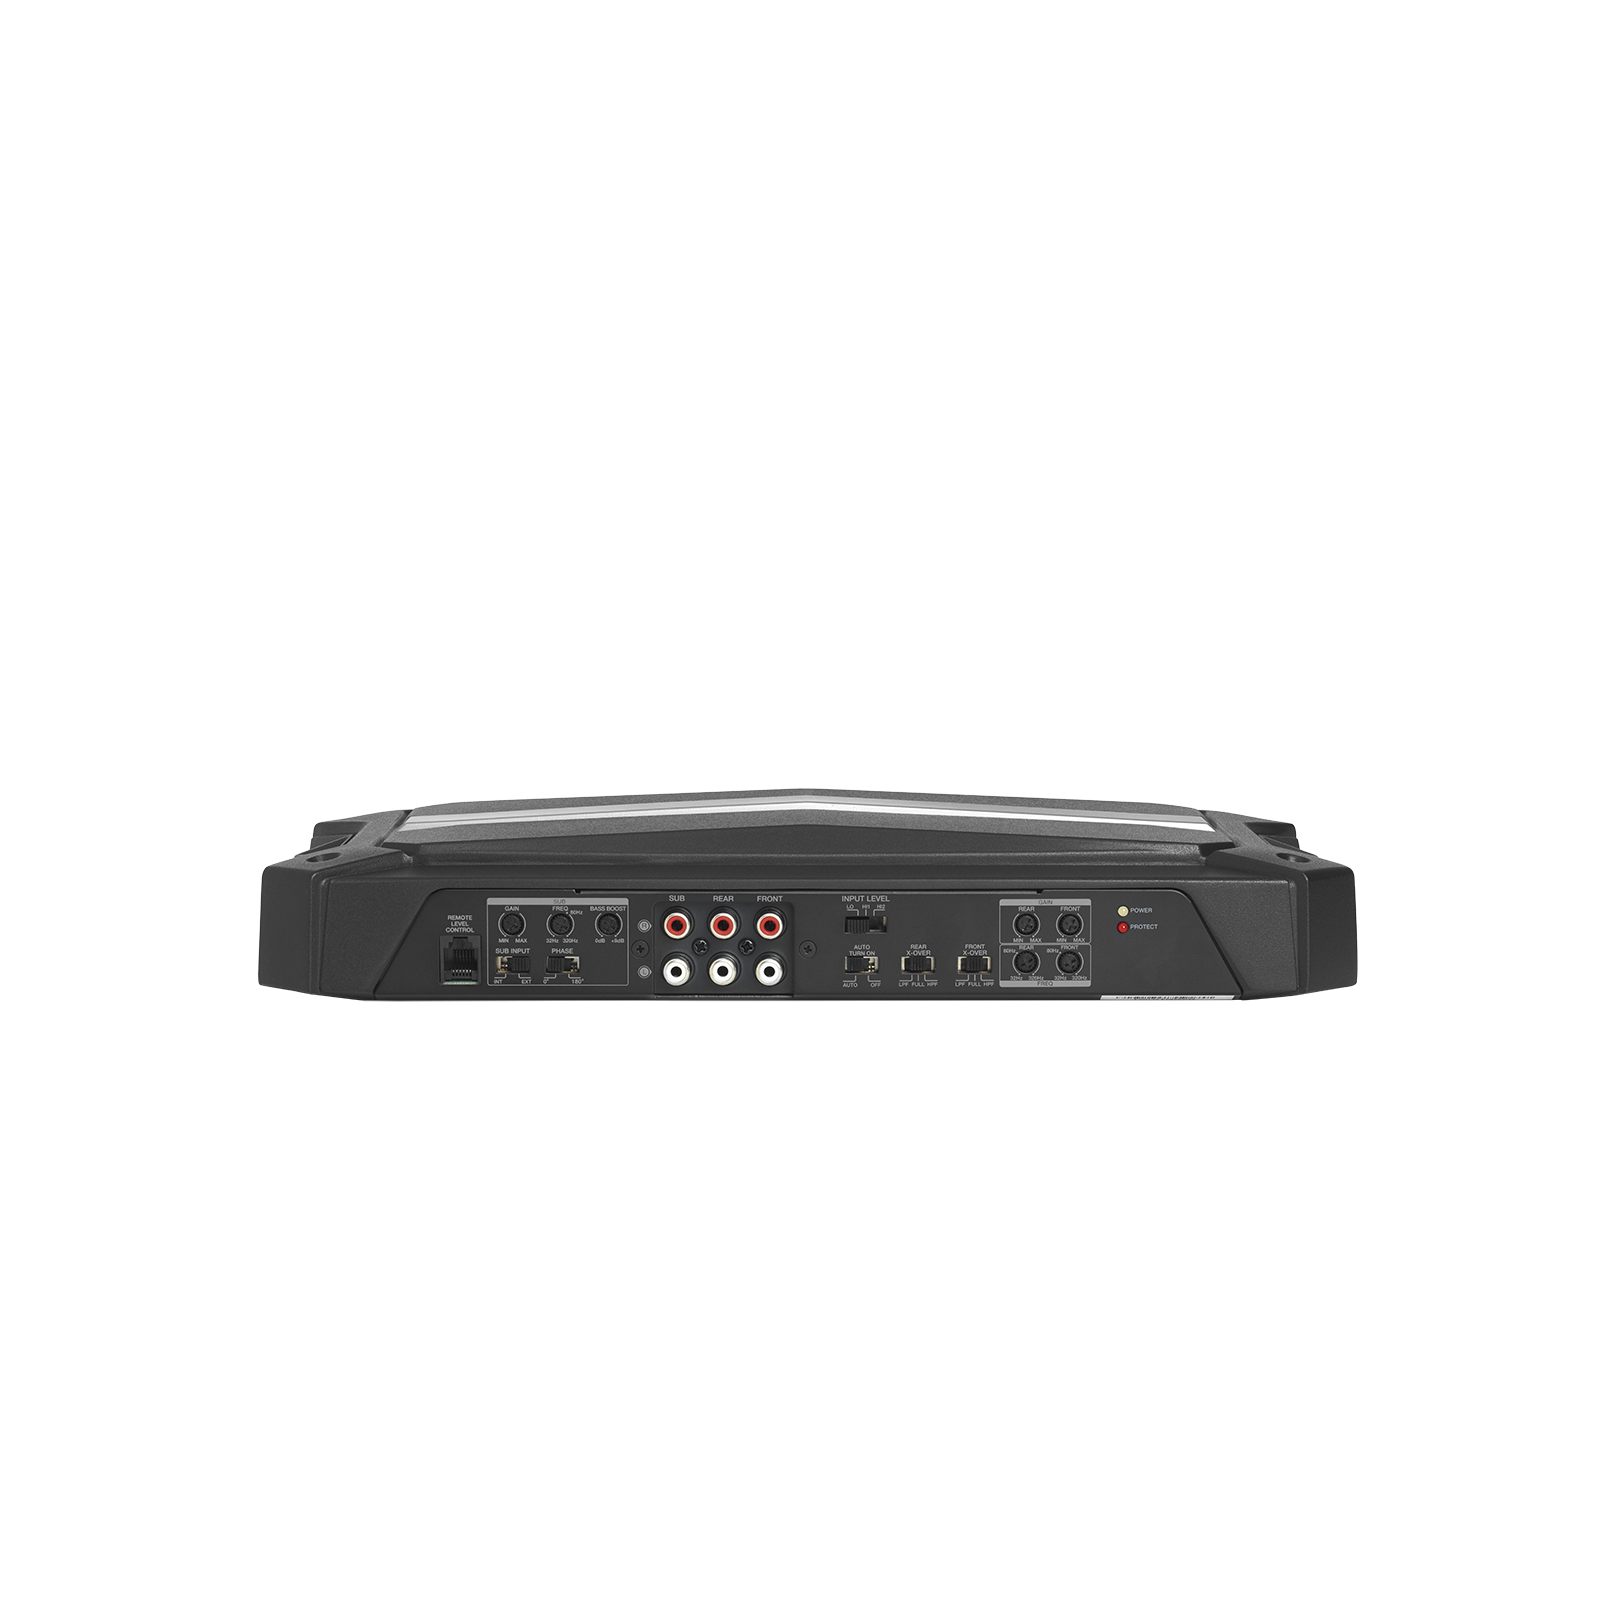 Stadium 5 - Black - High-performance multi-channel Class D amplifier - Detailshot 2